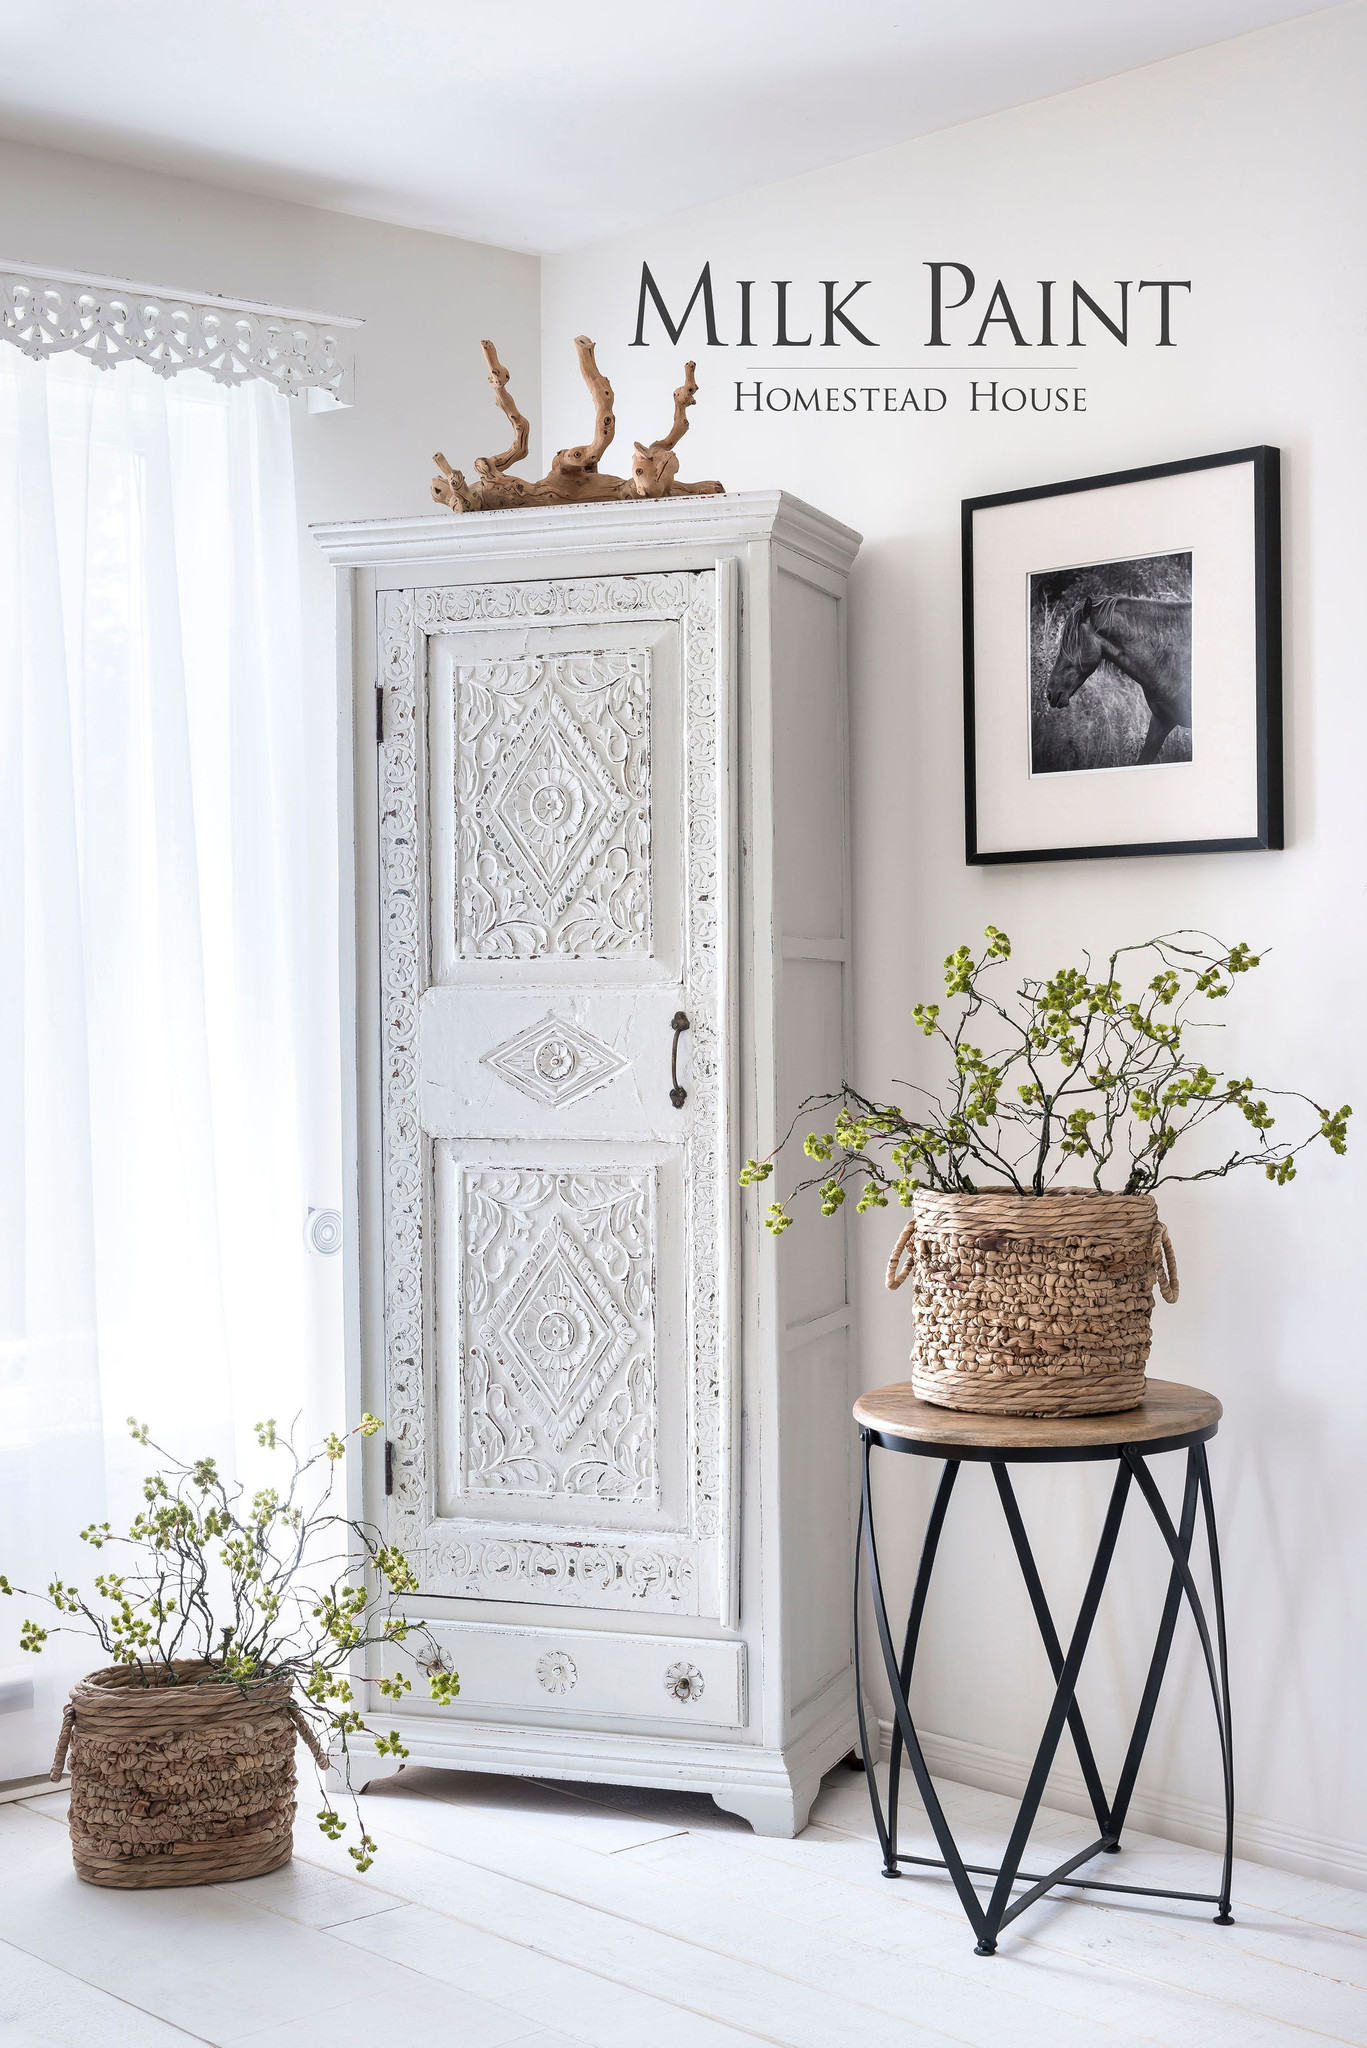 Homestead House HH - Milk Paint - Raw Silk - 230gr